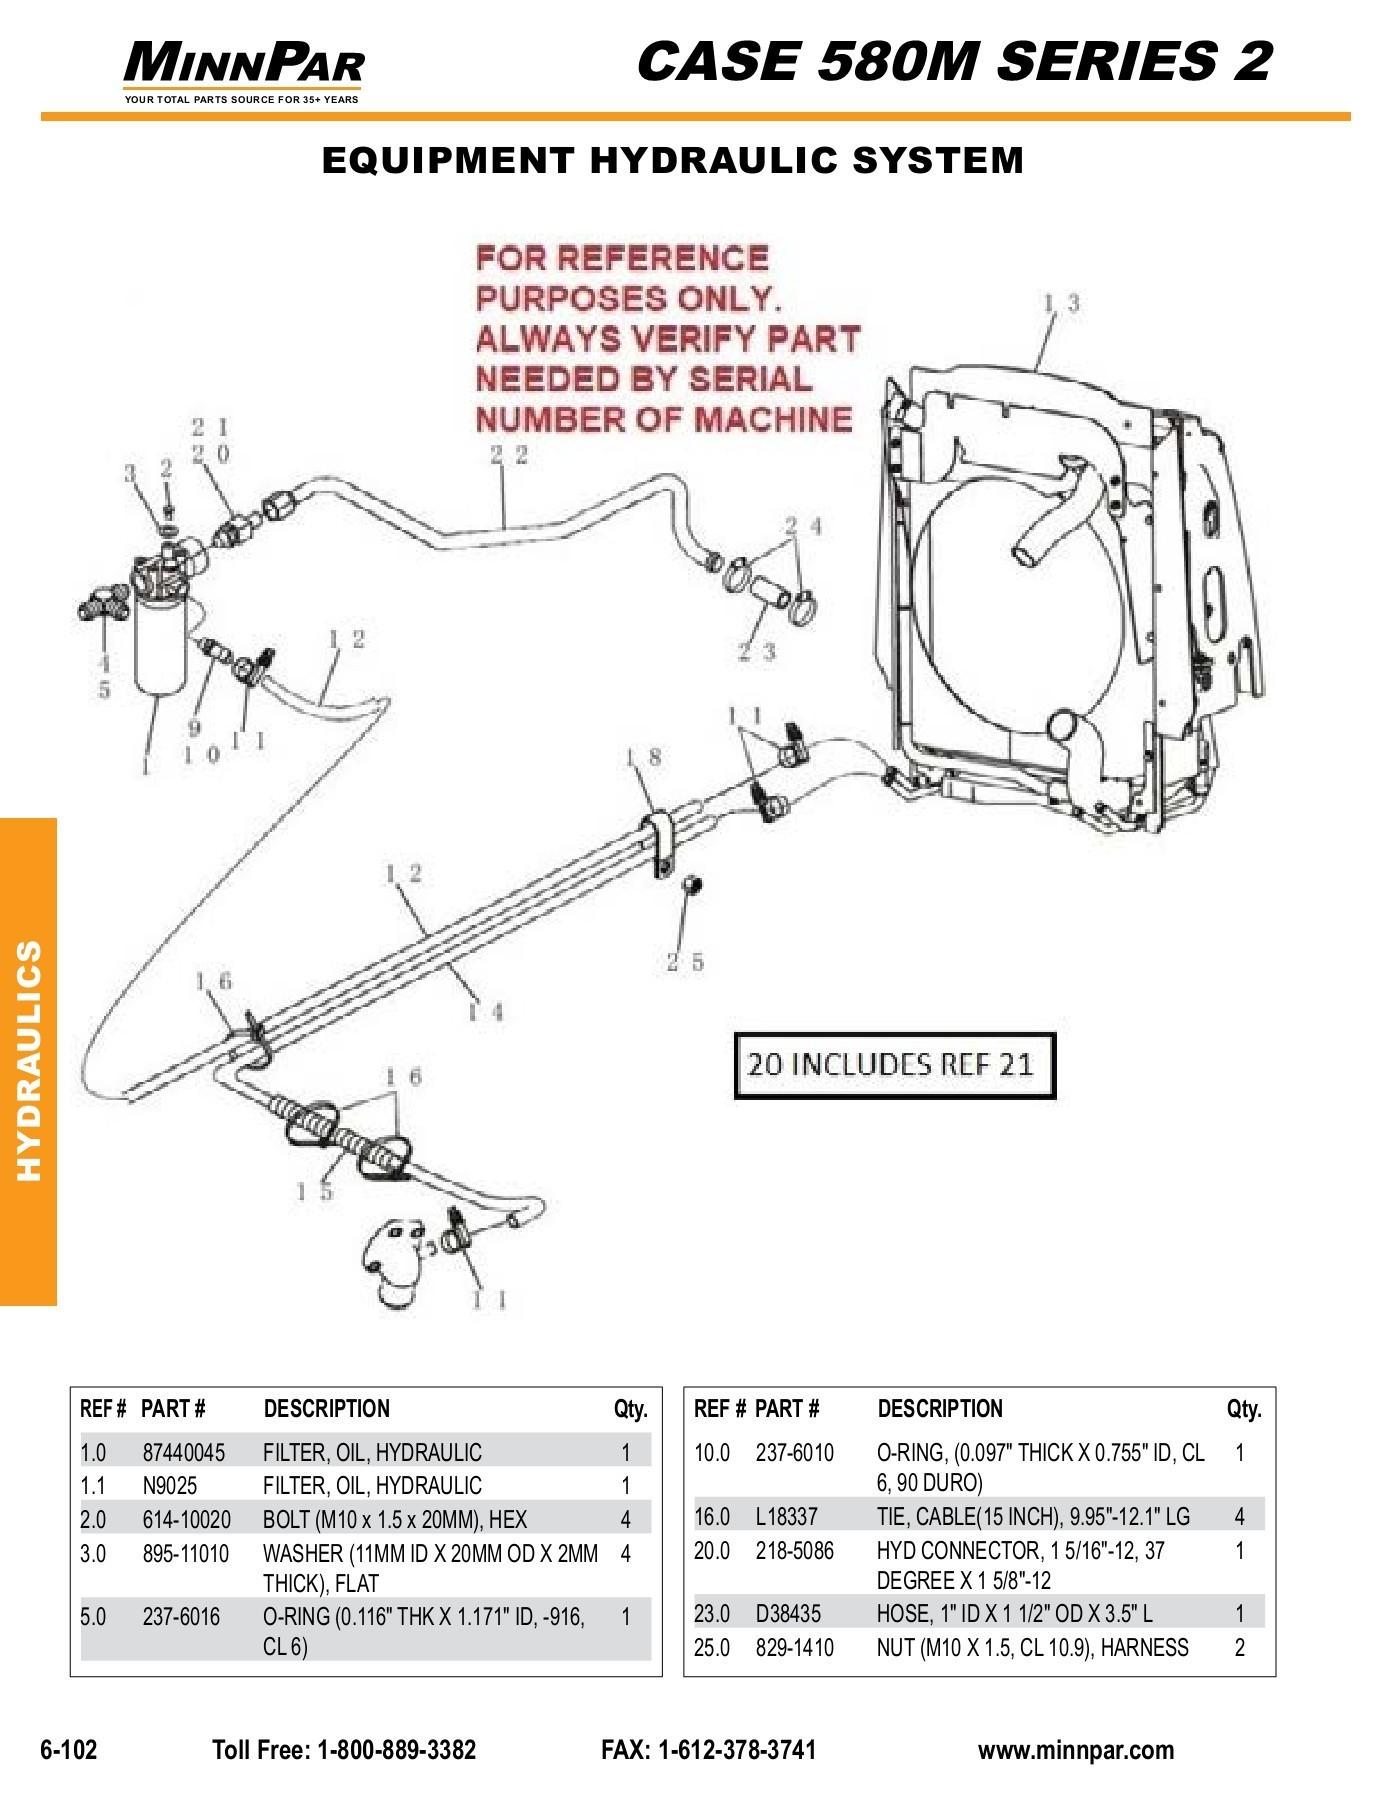 Case Backhoe Parts Diagram | My Wiring DIagram